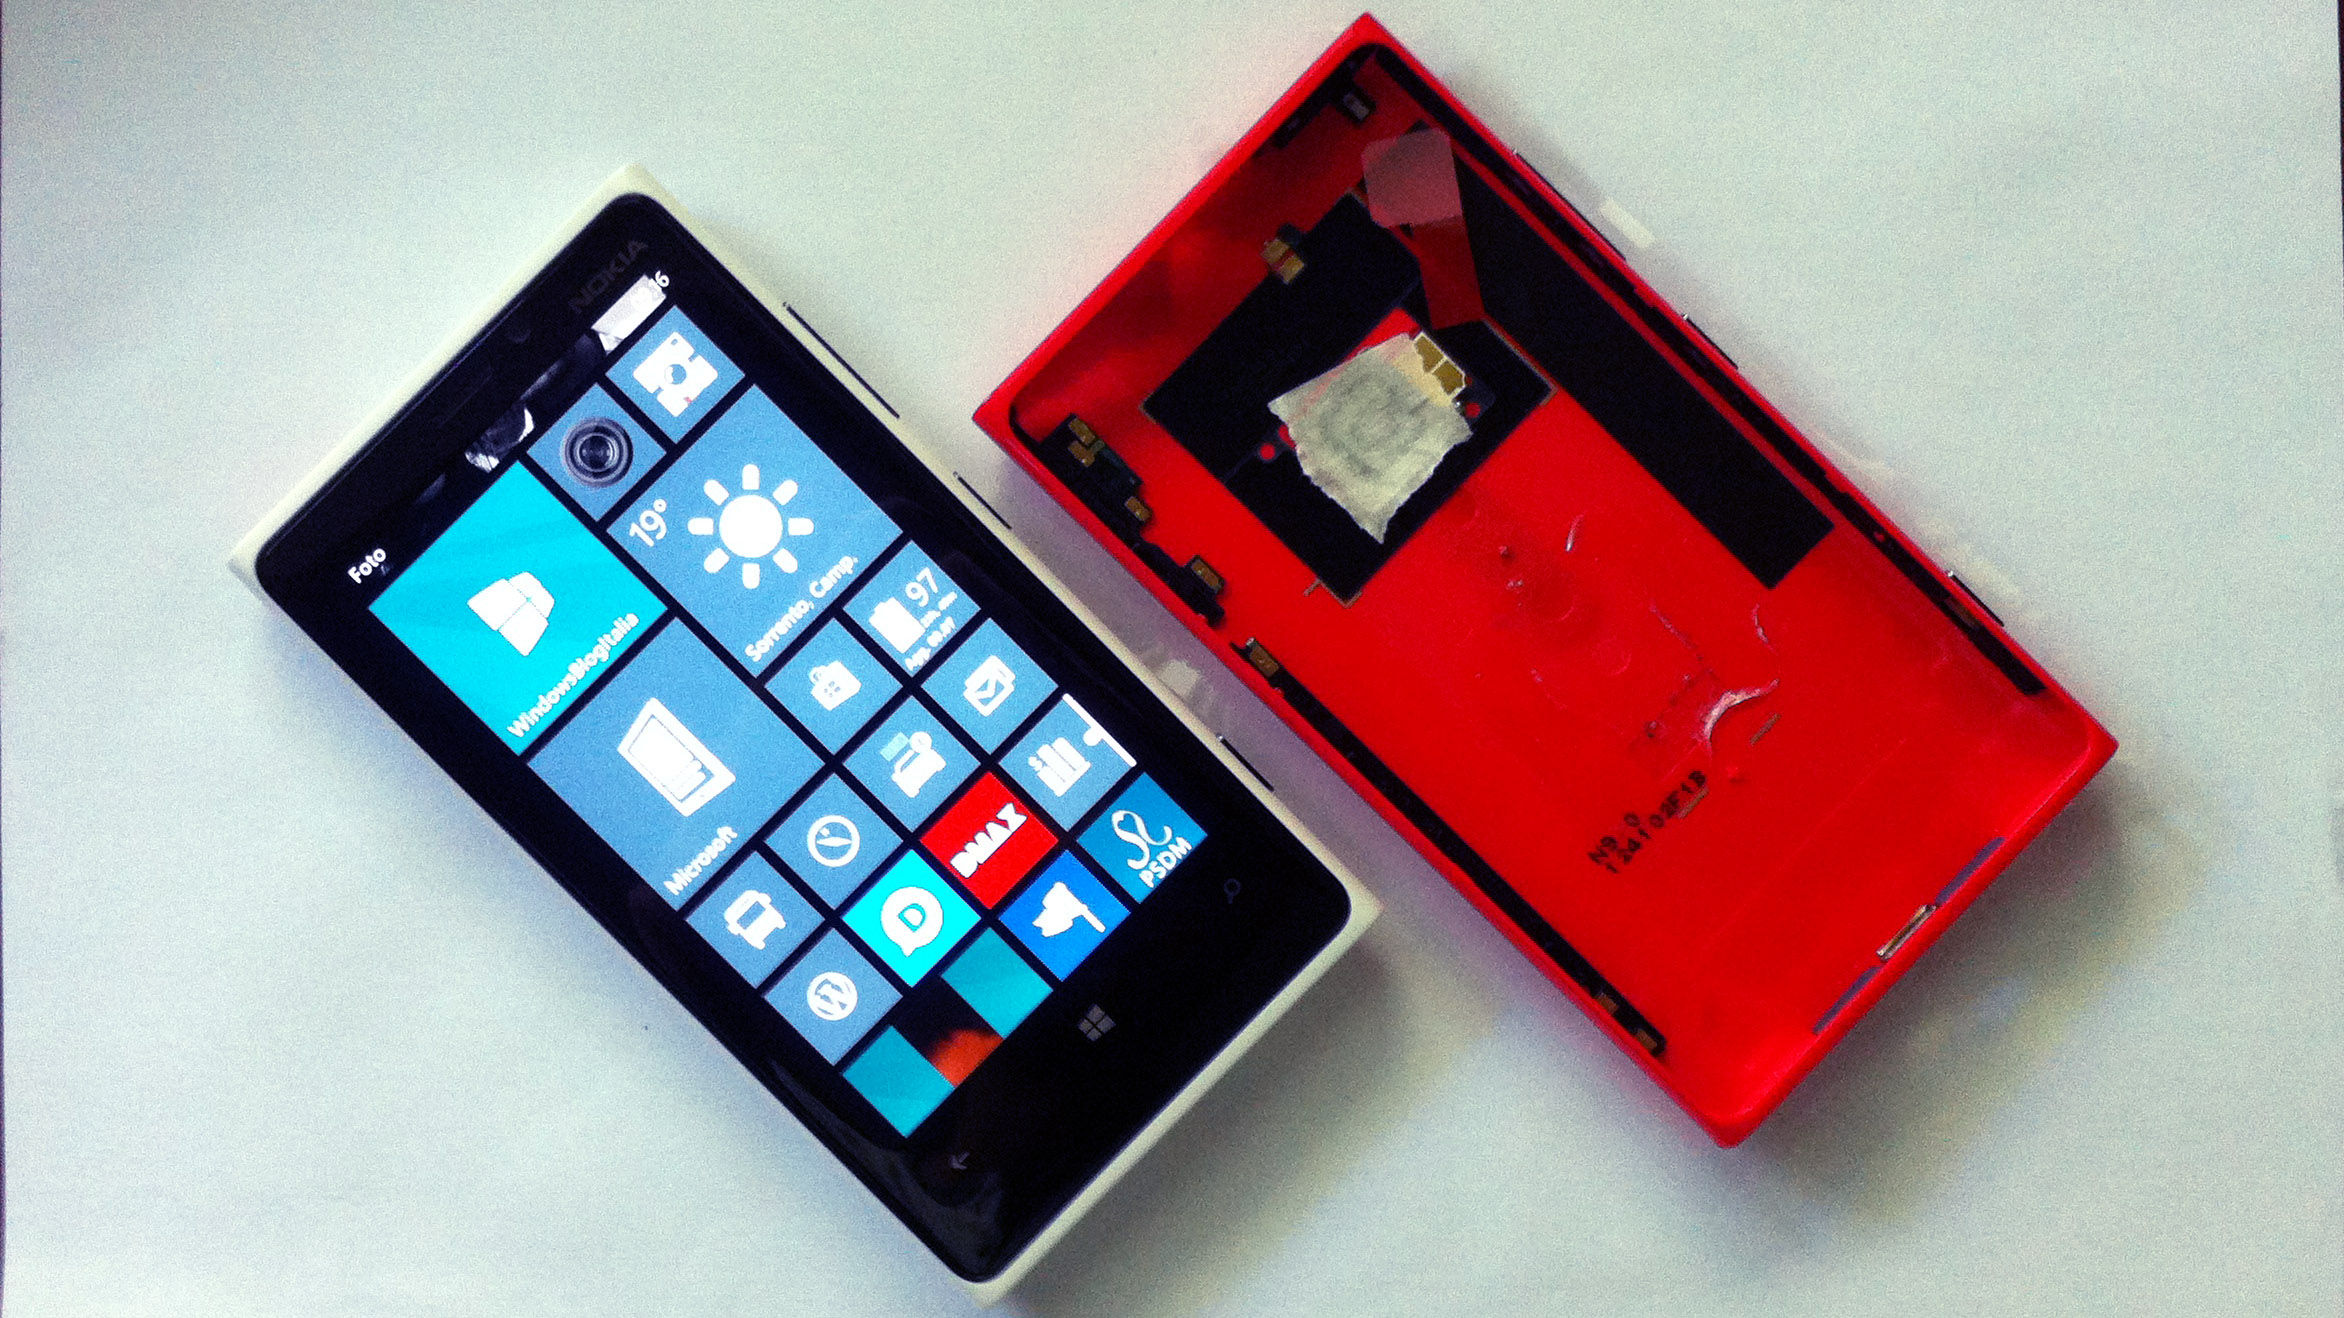 Nokia Lumia 920 Case Replace